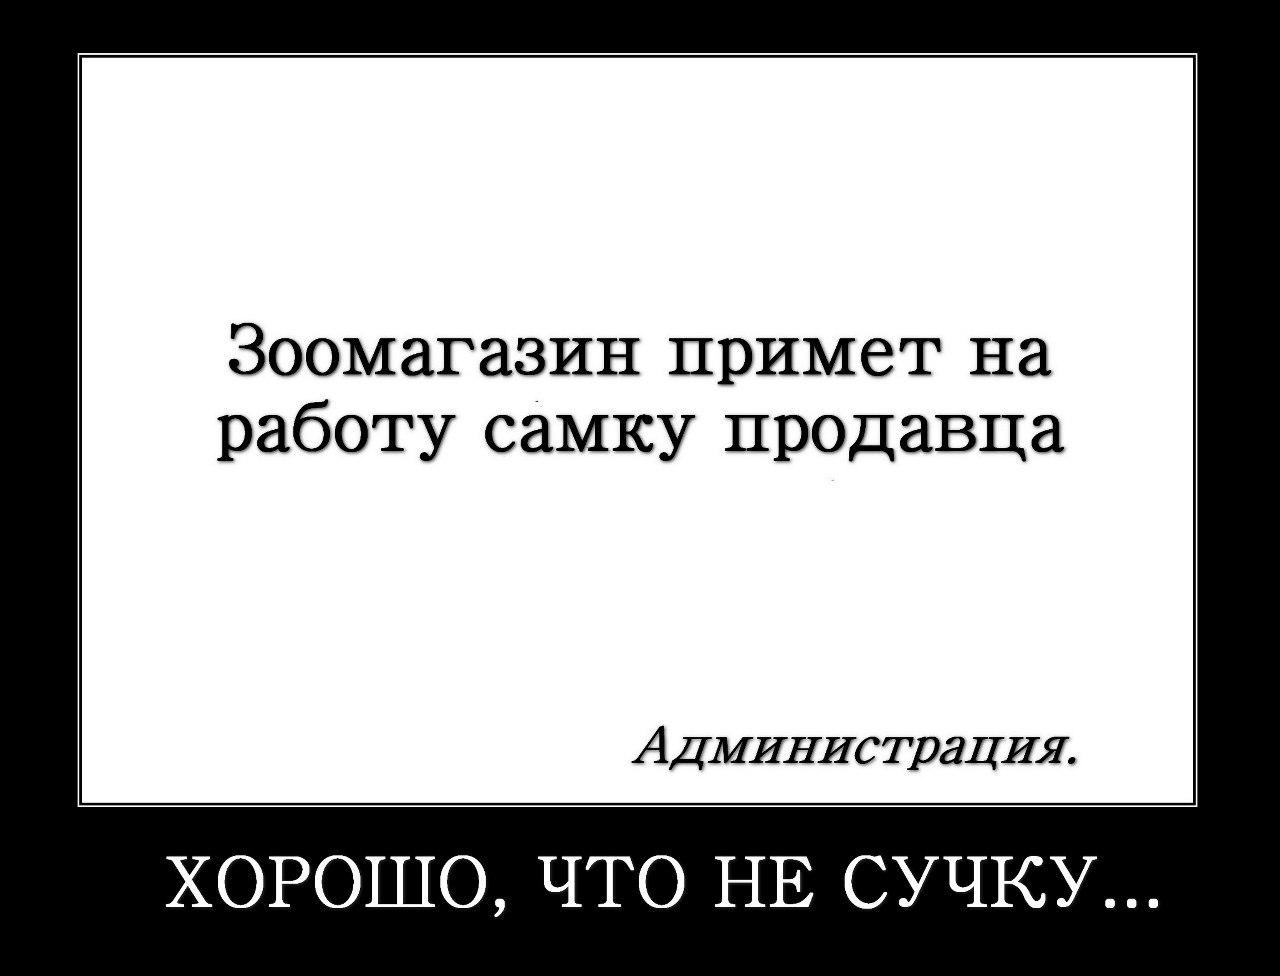 Аренда квартиры ул красноармейская в иркутске домике командира